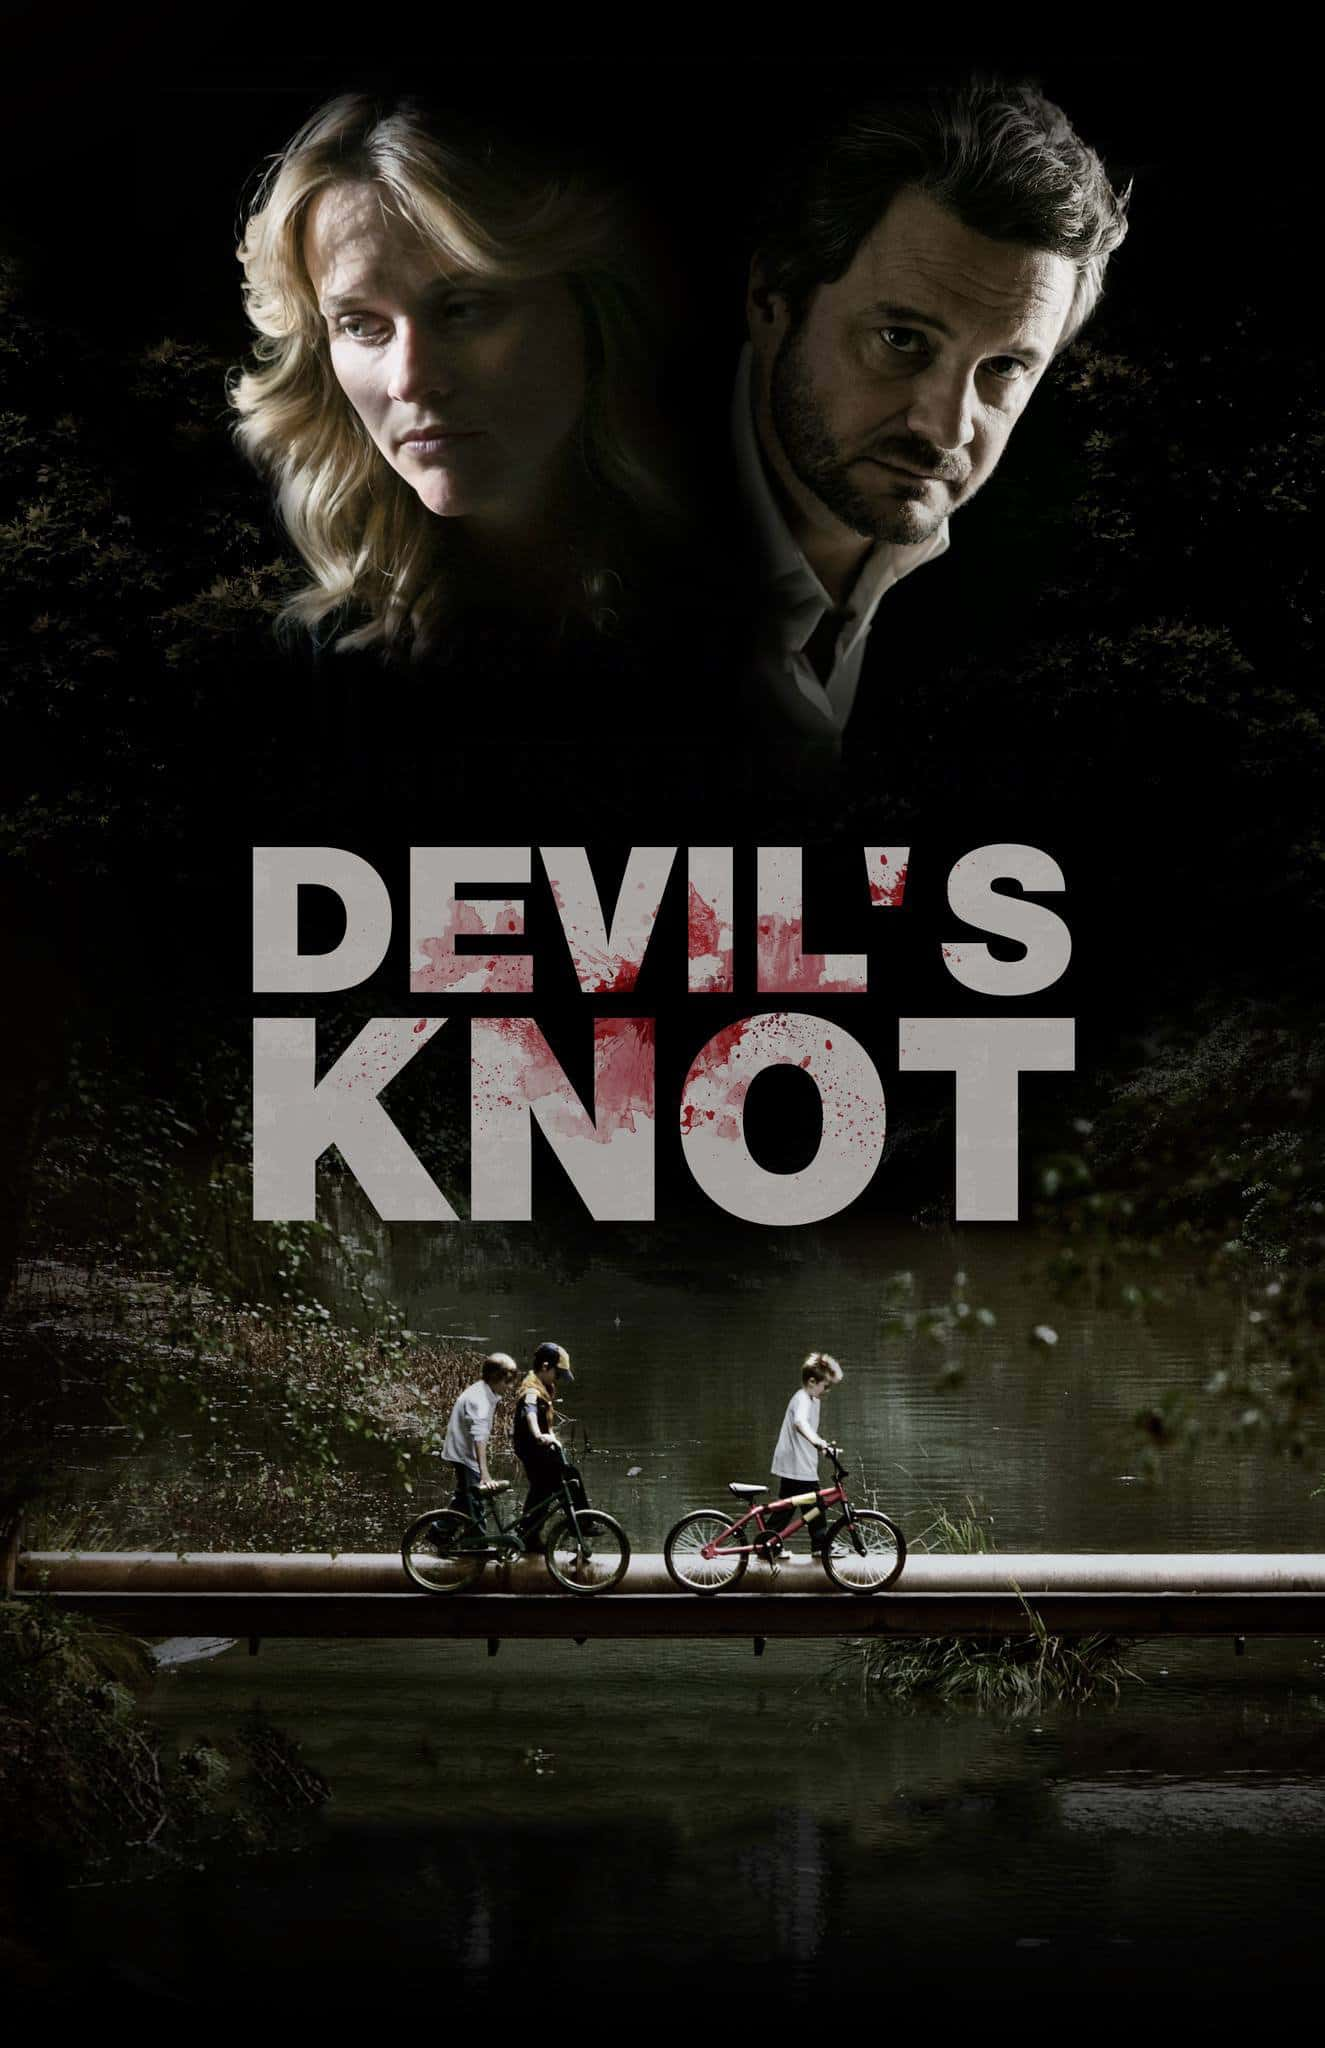 Devil's Knot, 2013